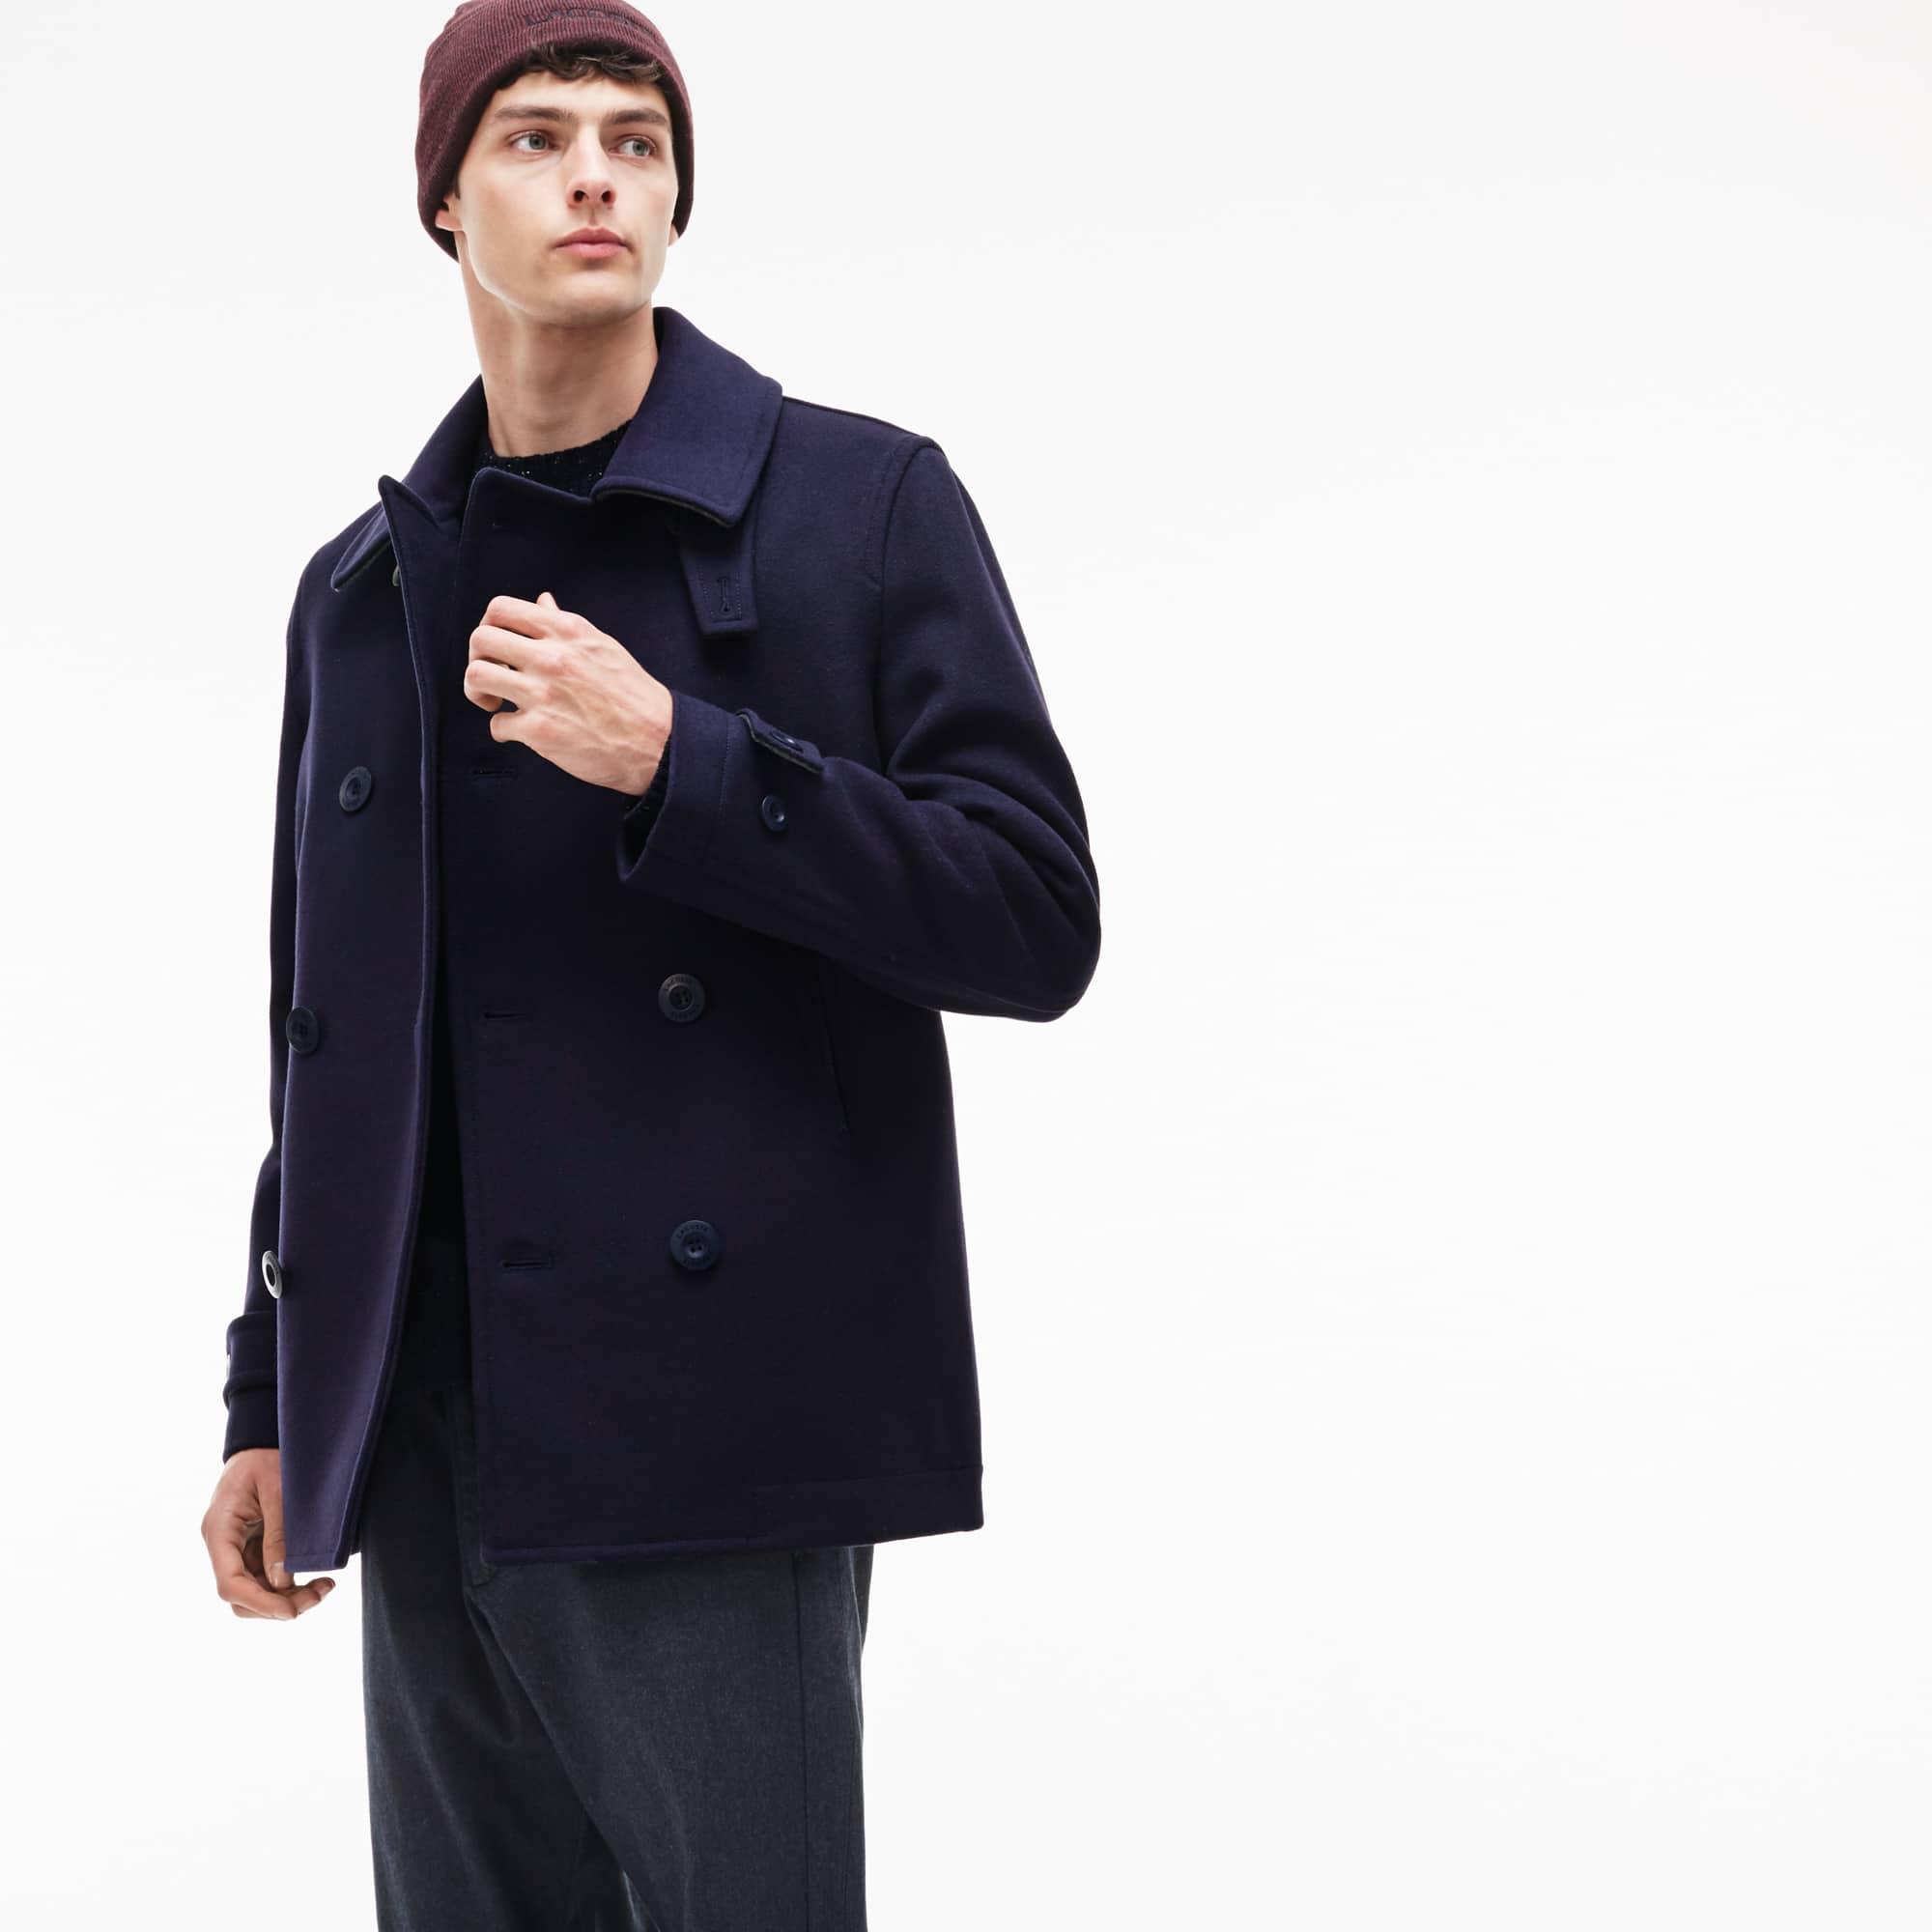 Men's Buttoned Wool Broadcloth Pea Coat